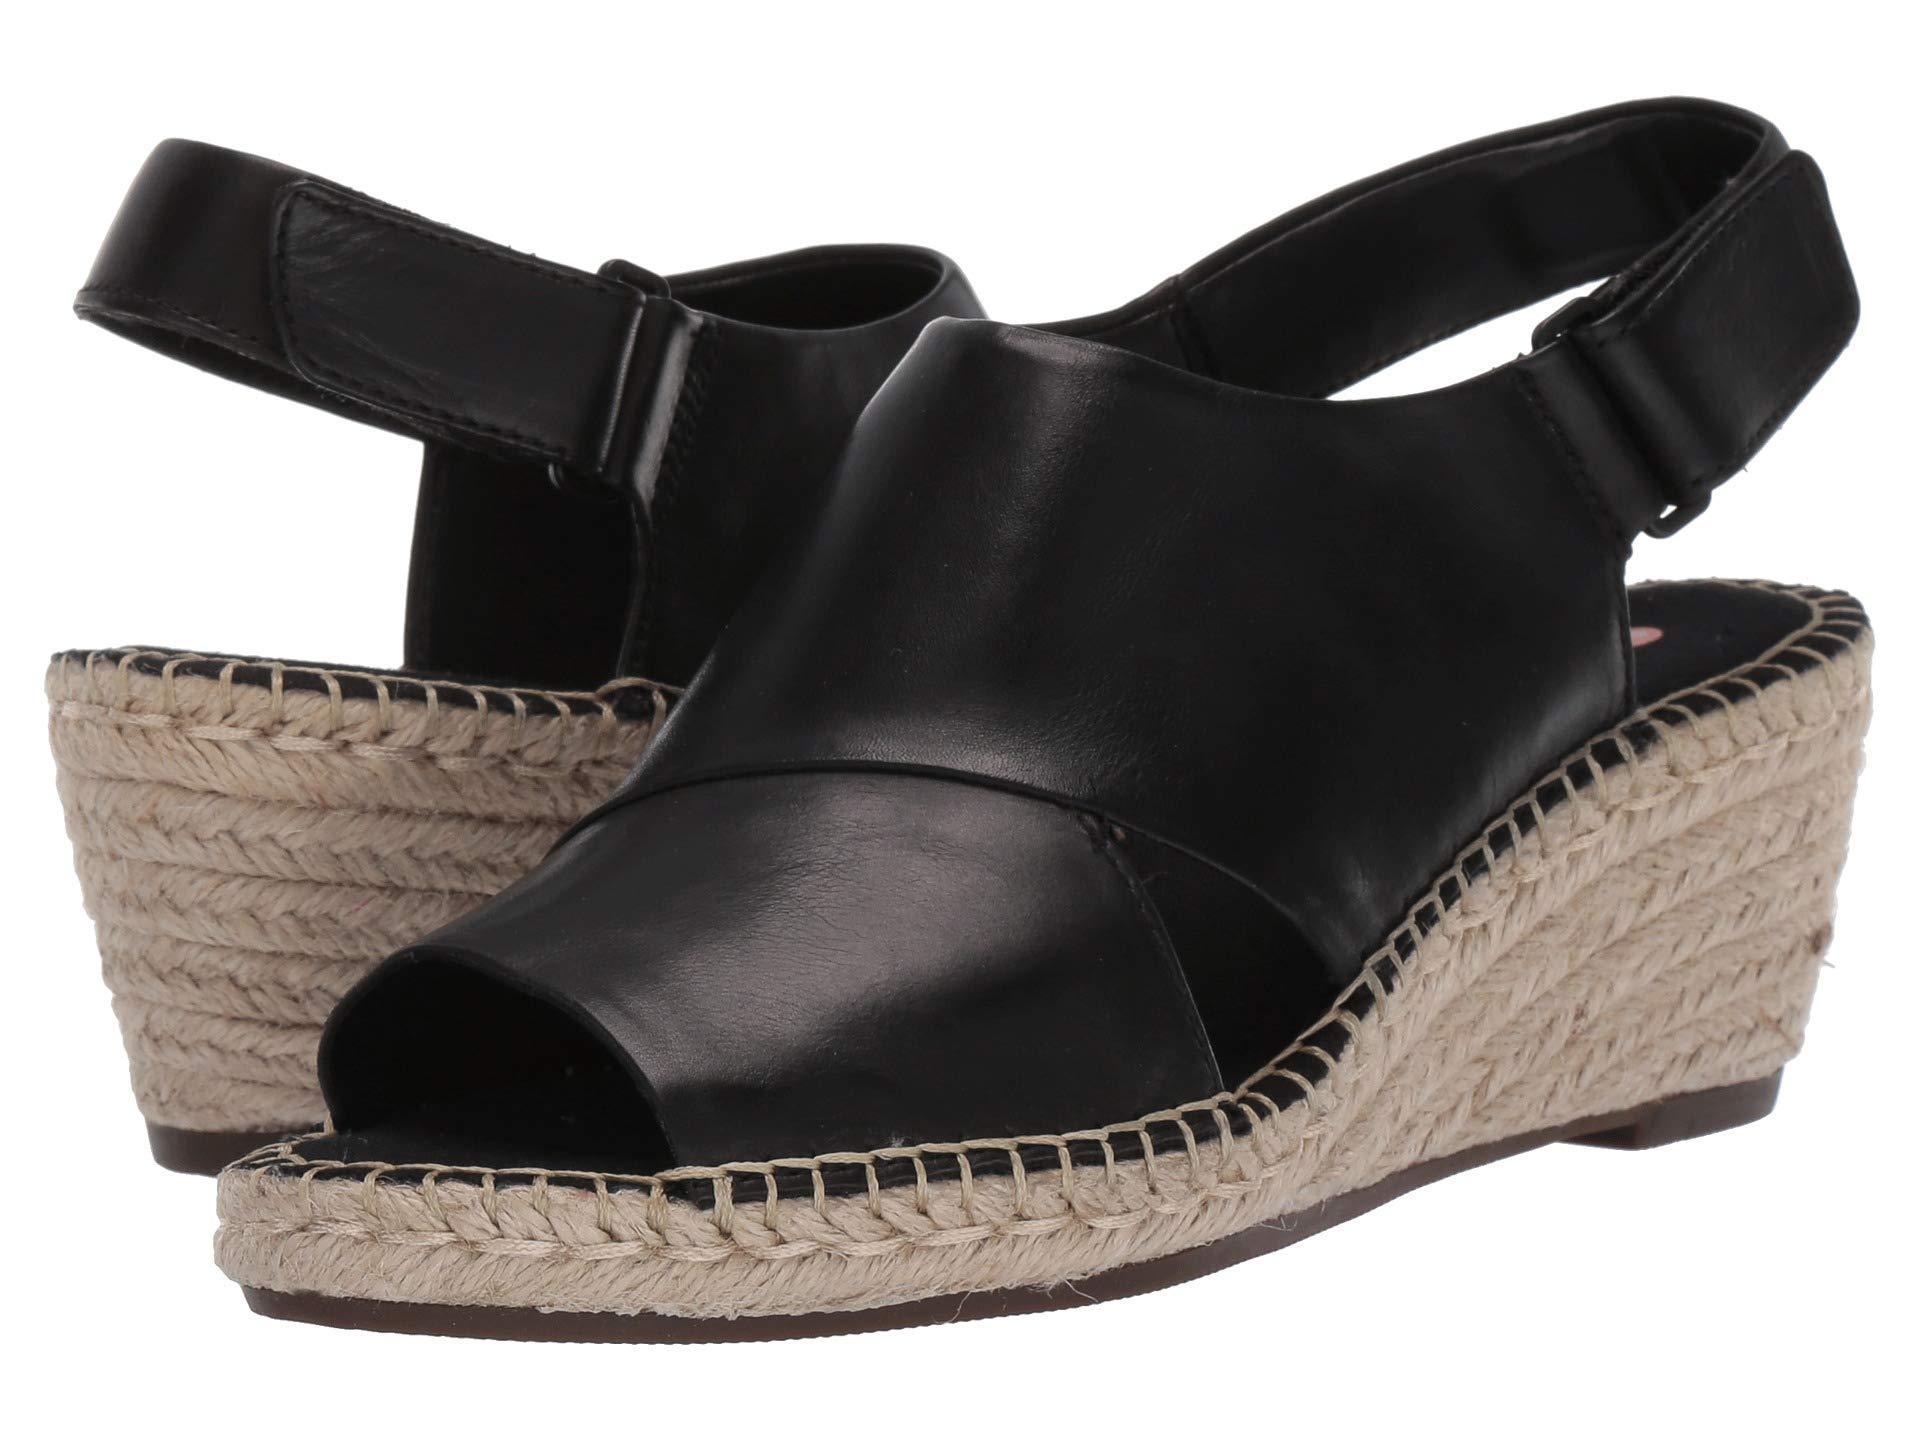 ed8a7cbbff296 Lyst - Clarks Petrina Abby (light Tan Leather) Women's Wedge Shoes ...